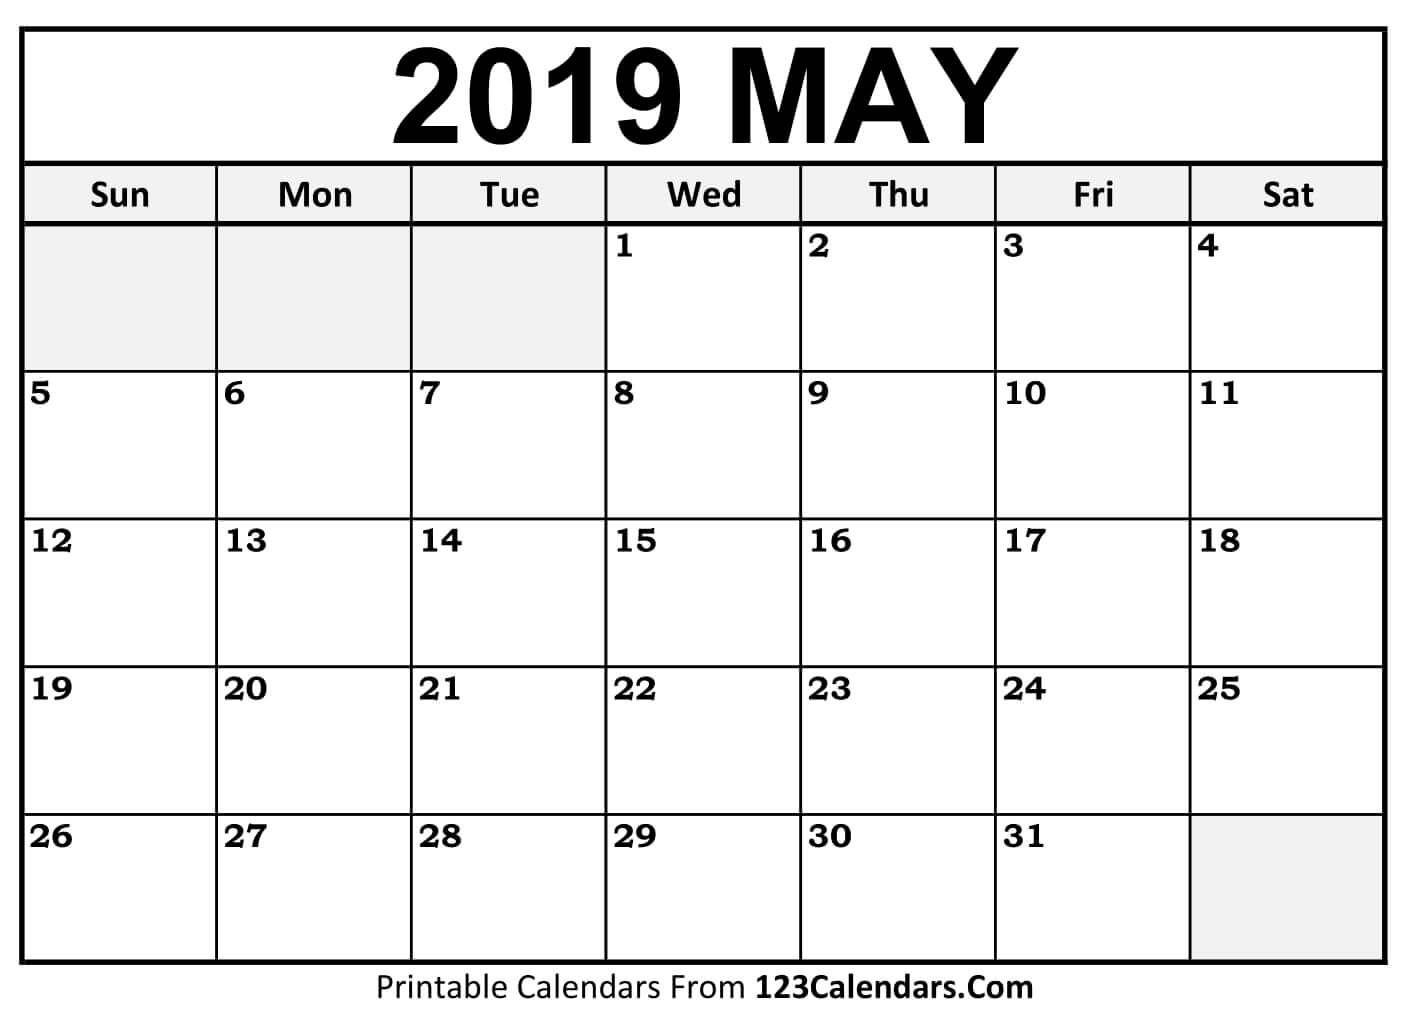 May Calendar Printable Templates